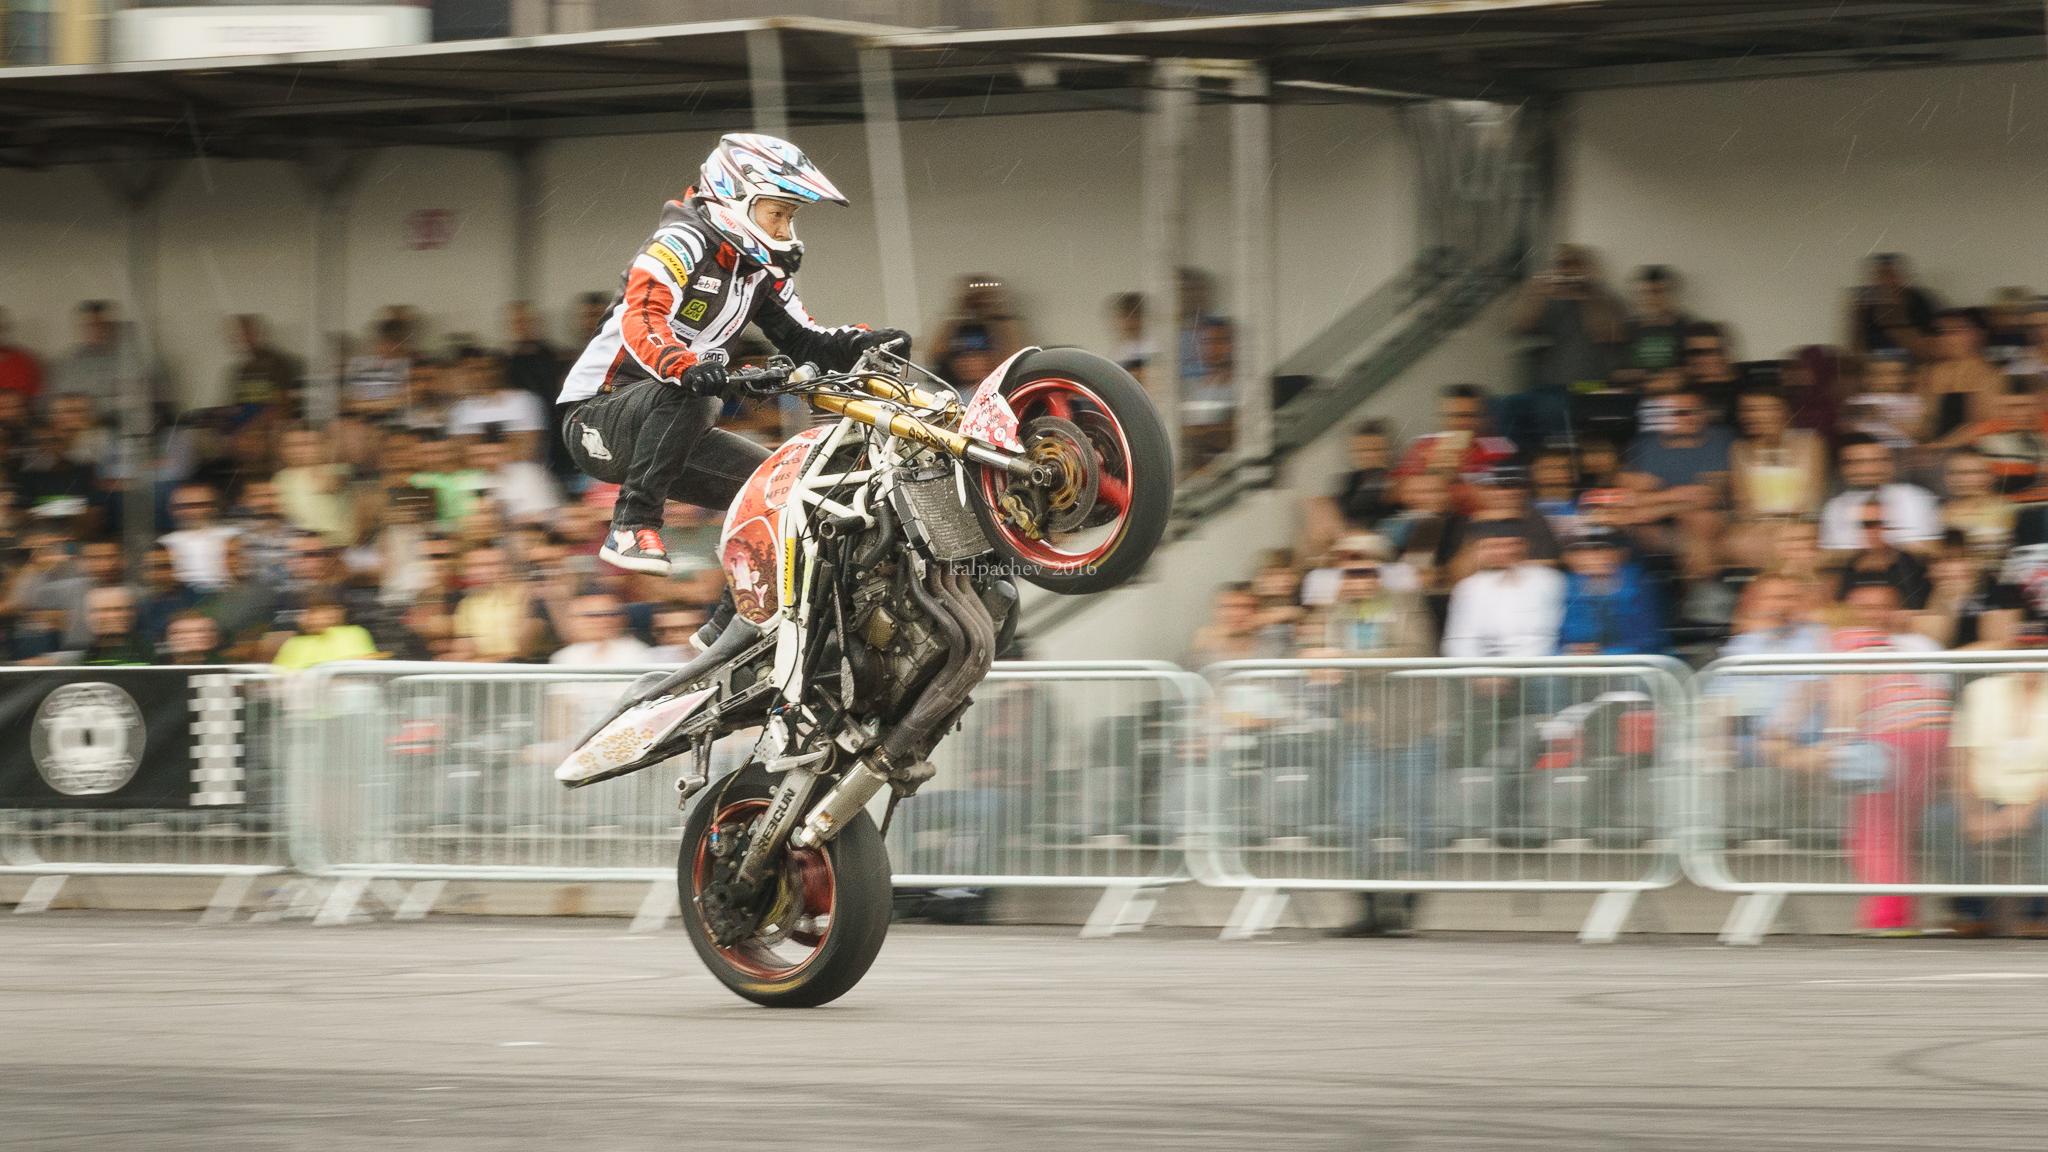 OGA Hiroyuki at Stunt Festival & Streetfighter Show 2016 @acecafelondon